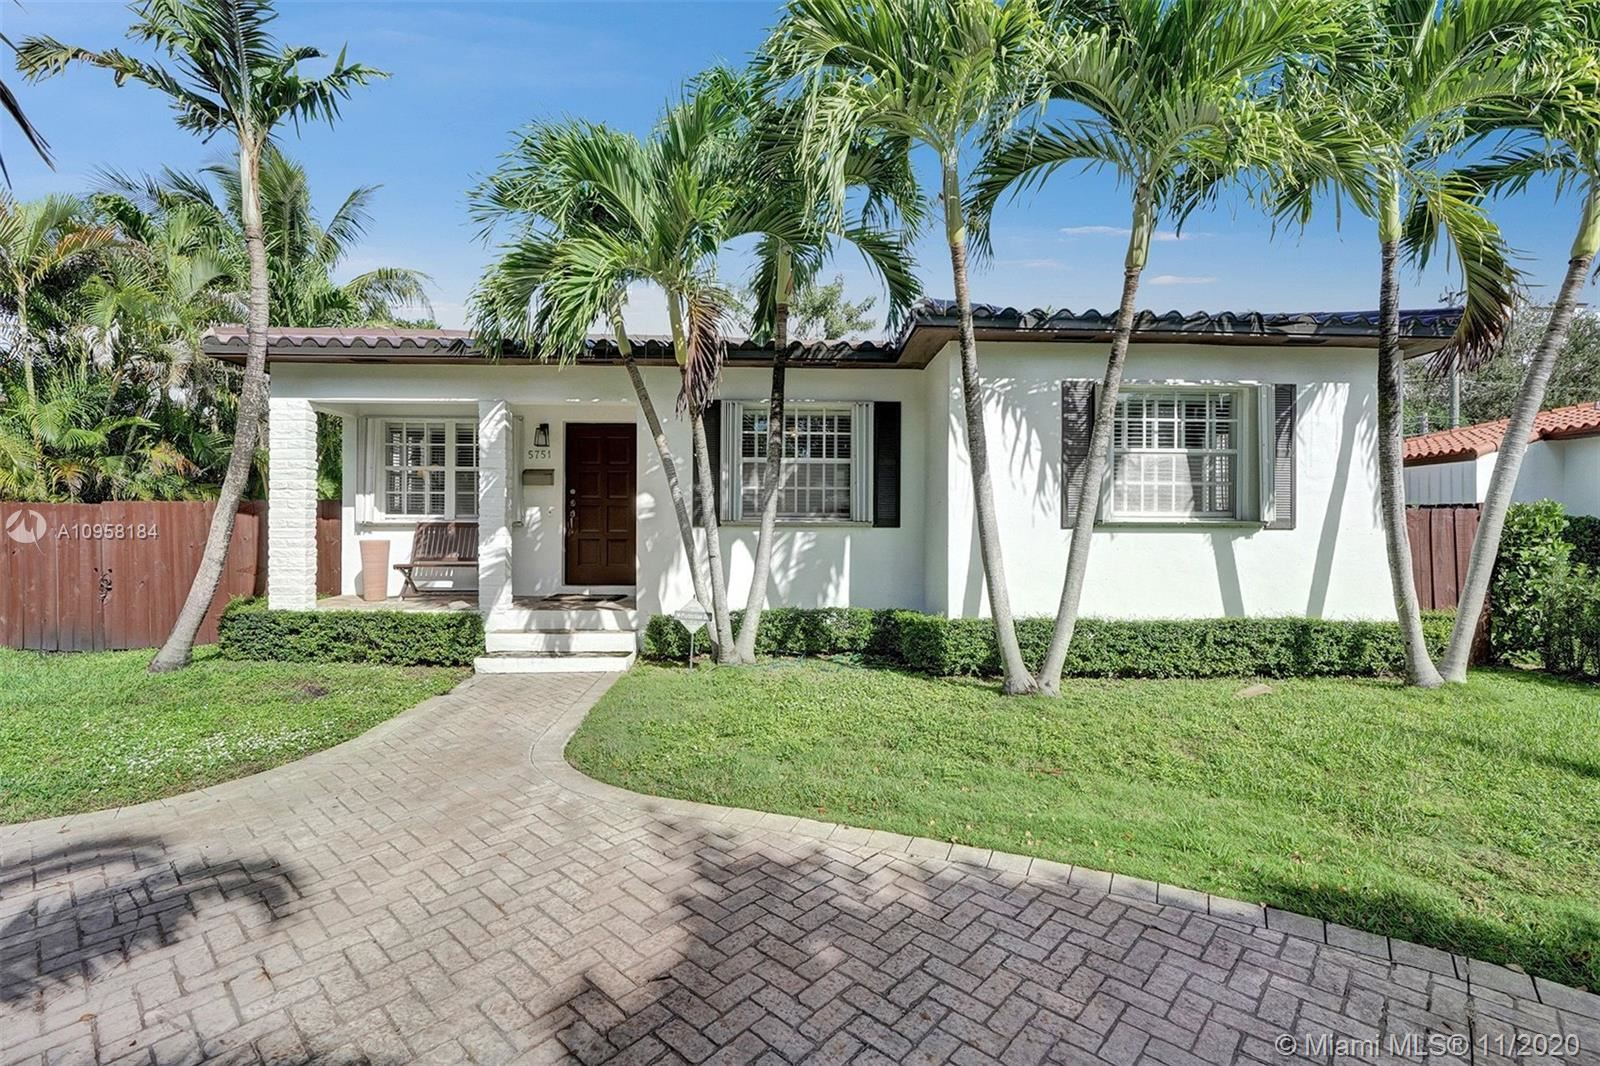 5751 SW 11th St, West Miami, FL 33144 - #: A10958184